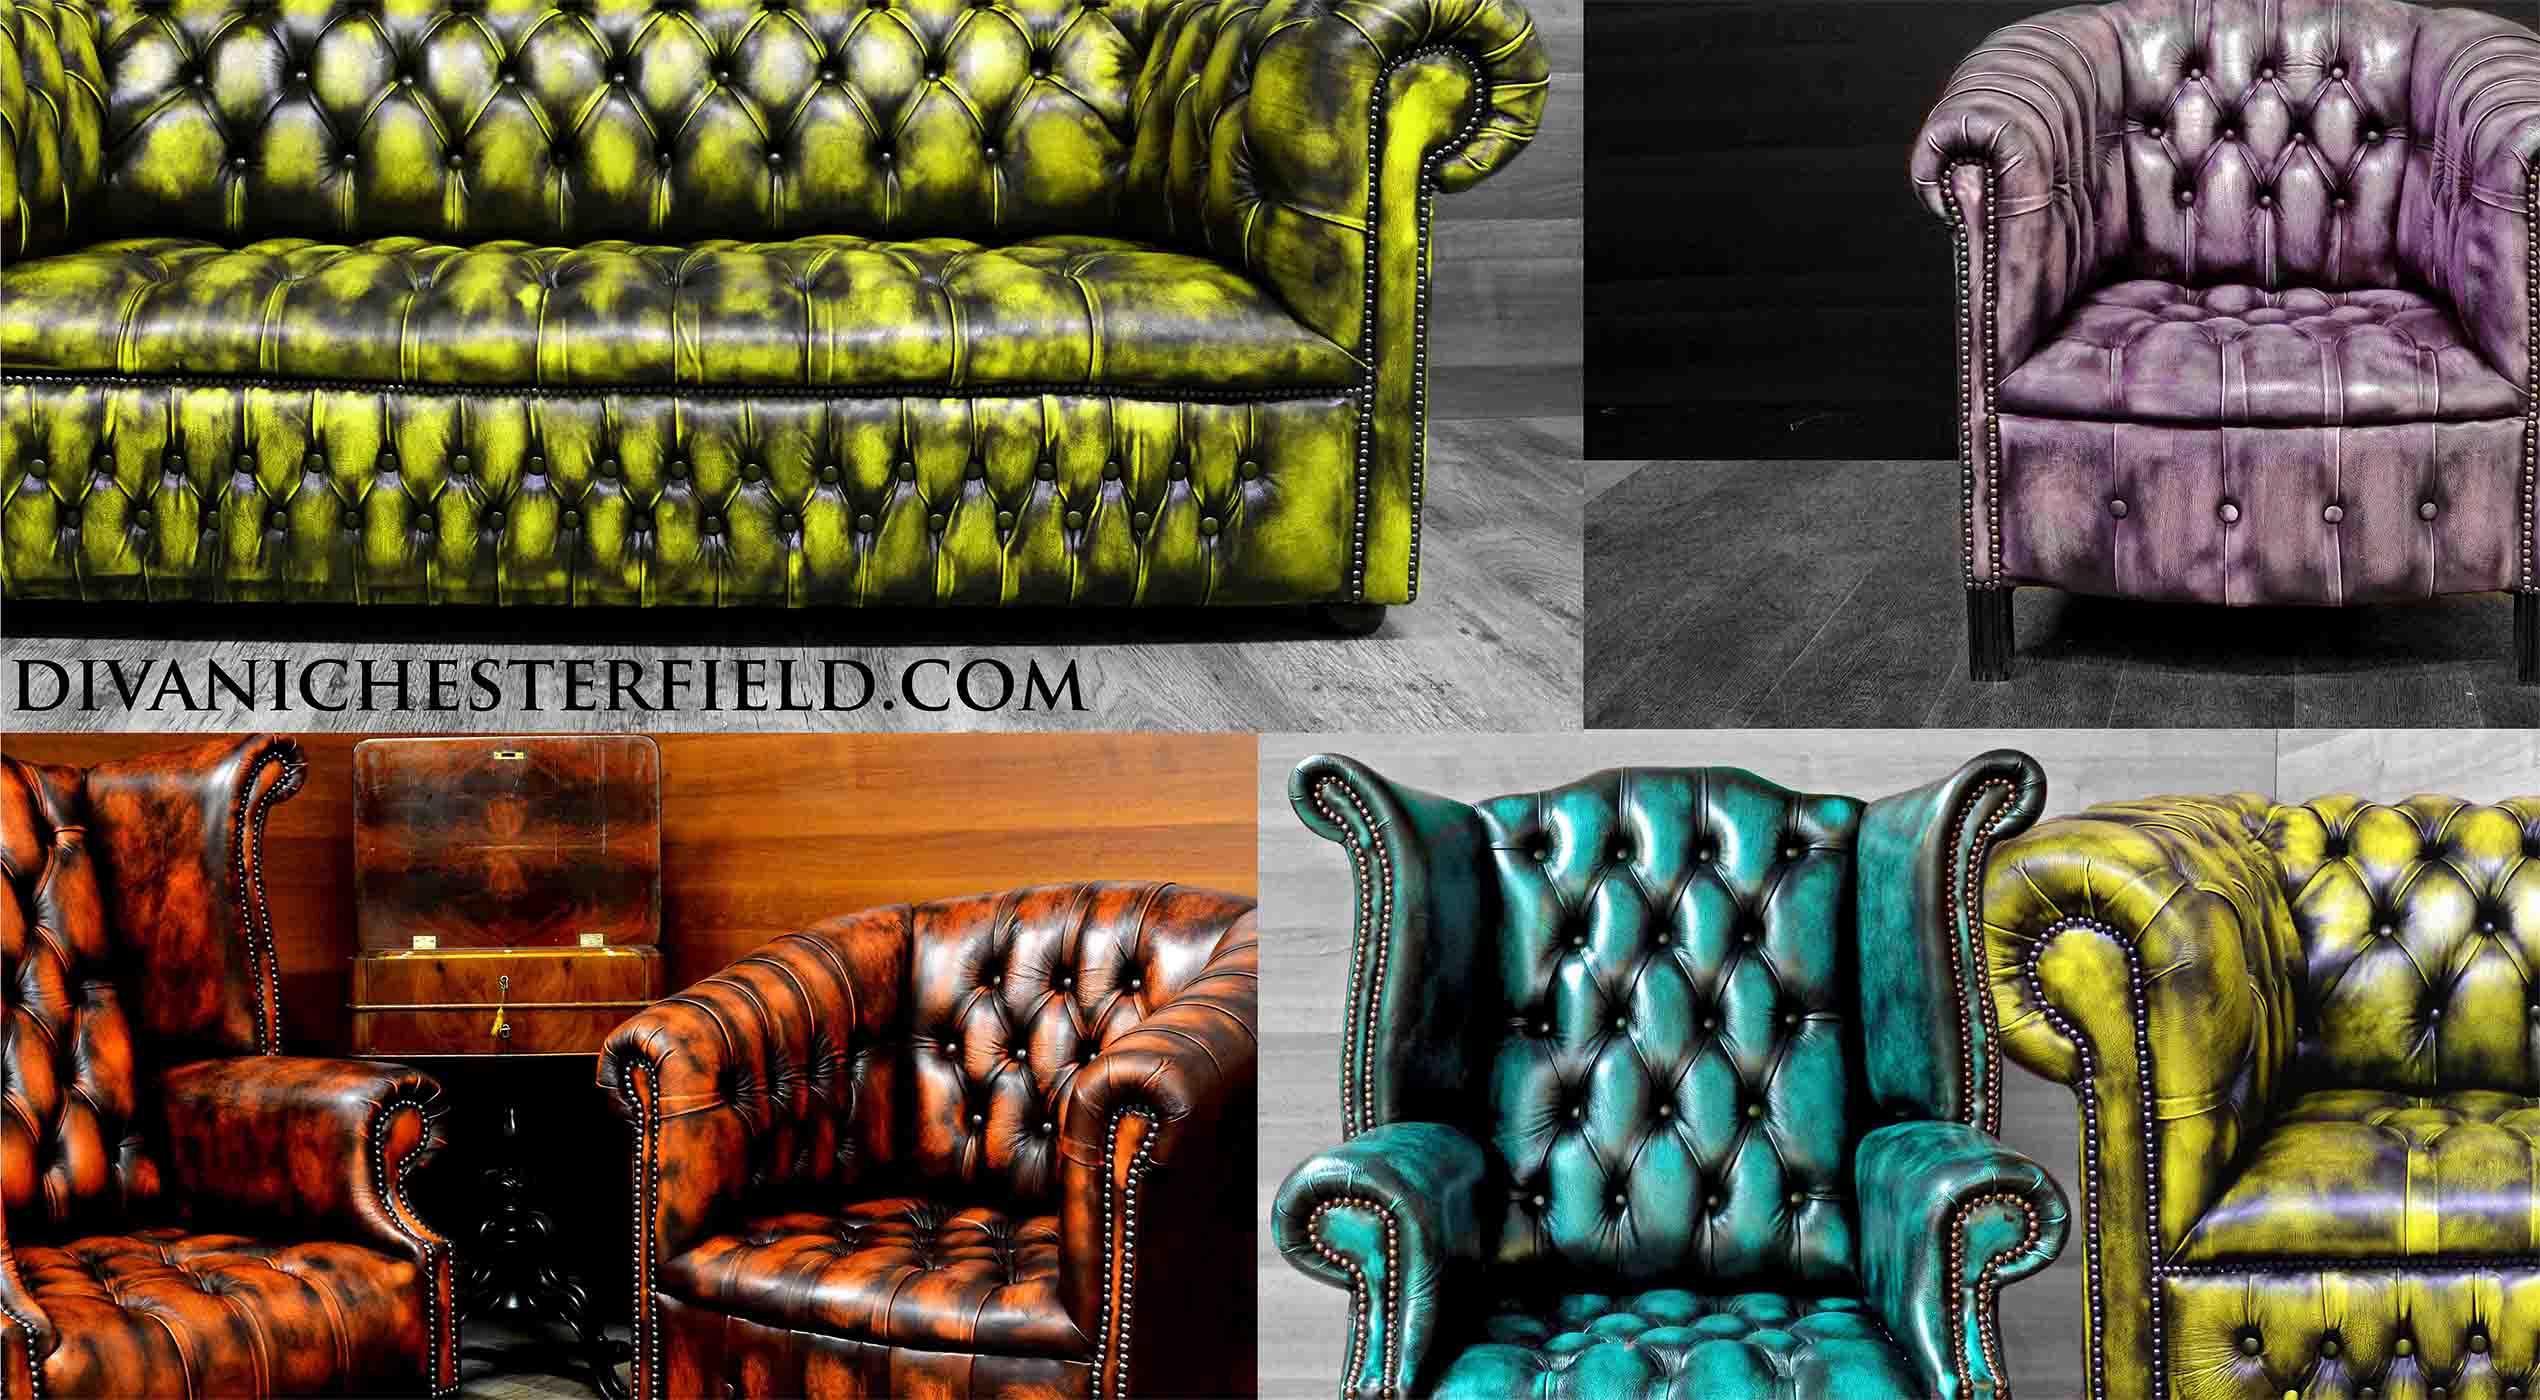 Divani Chesterfield Patchwork Harleq, Nuovi effetto Vintage, Pelli ...